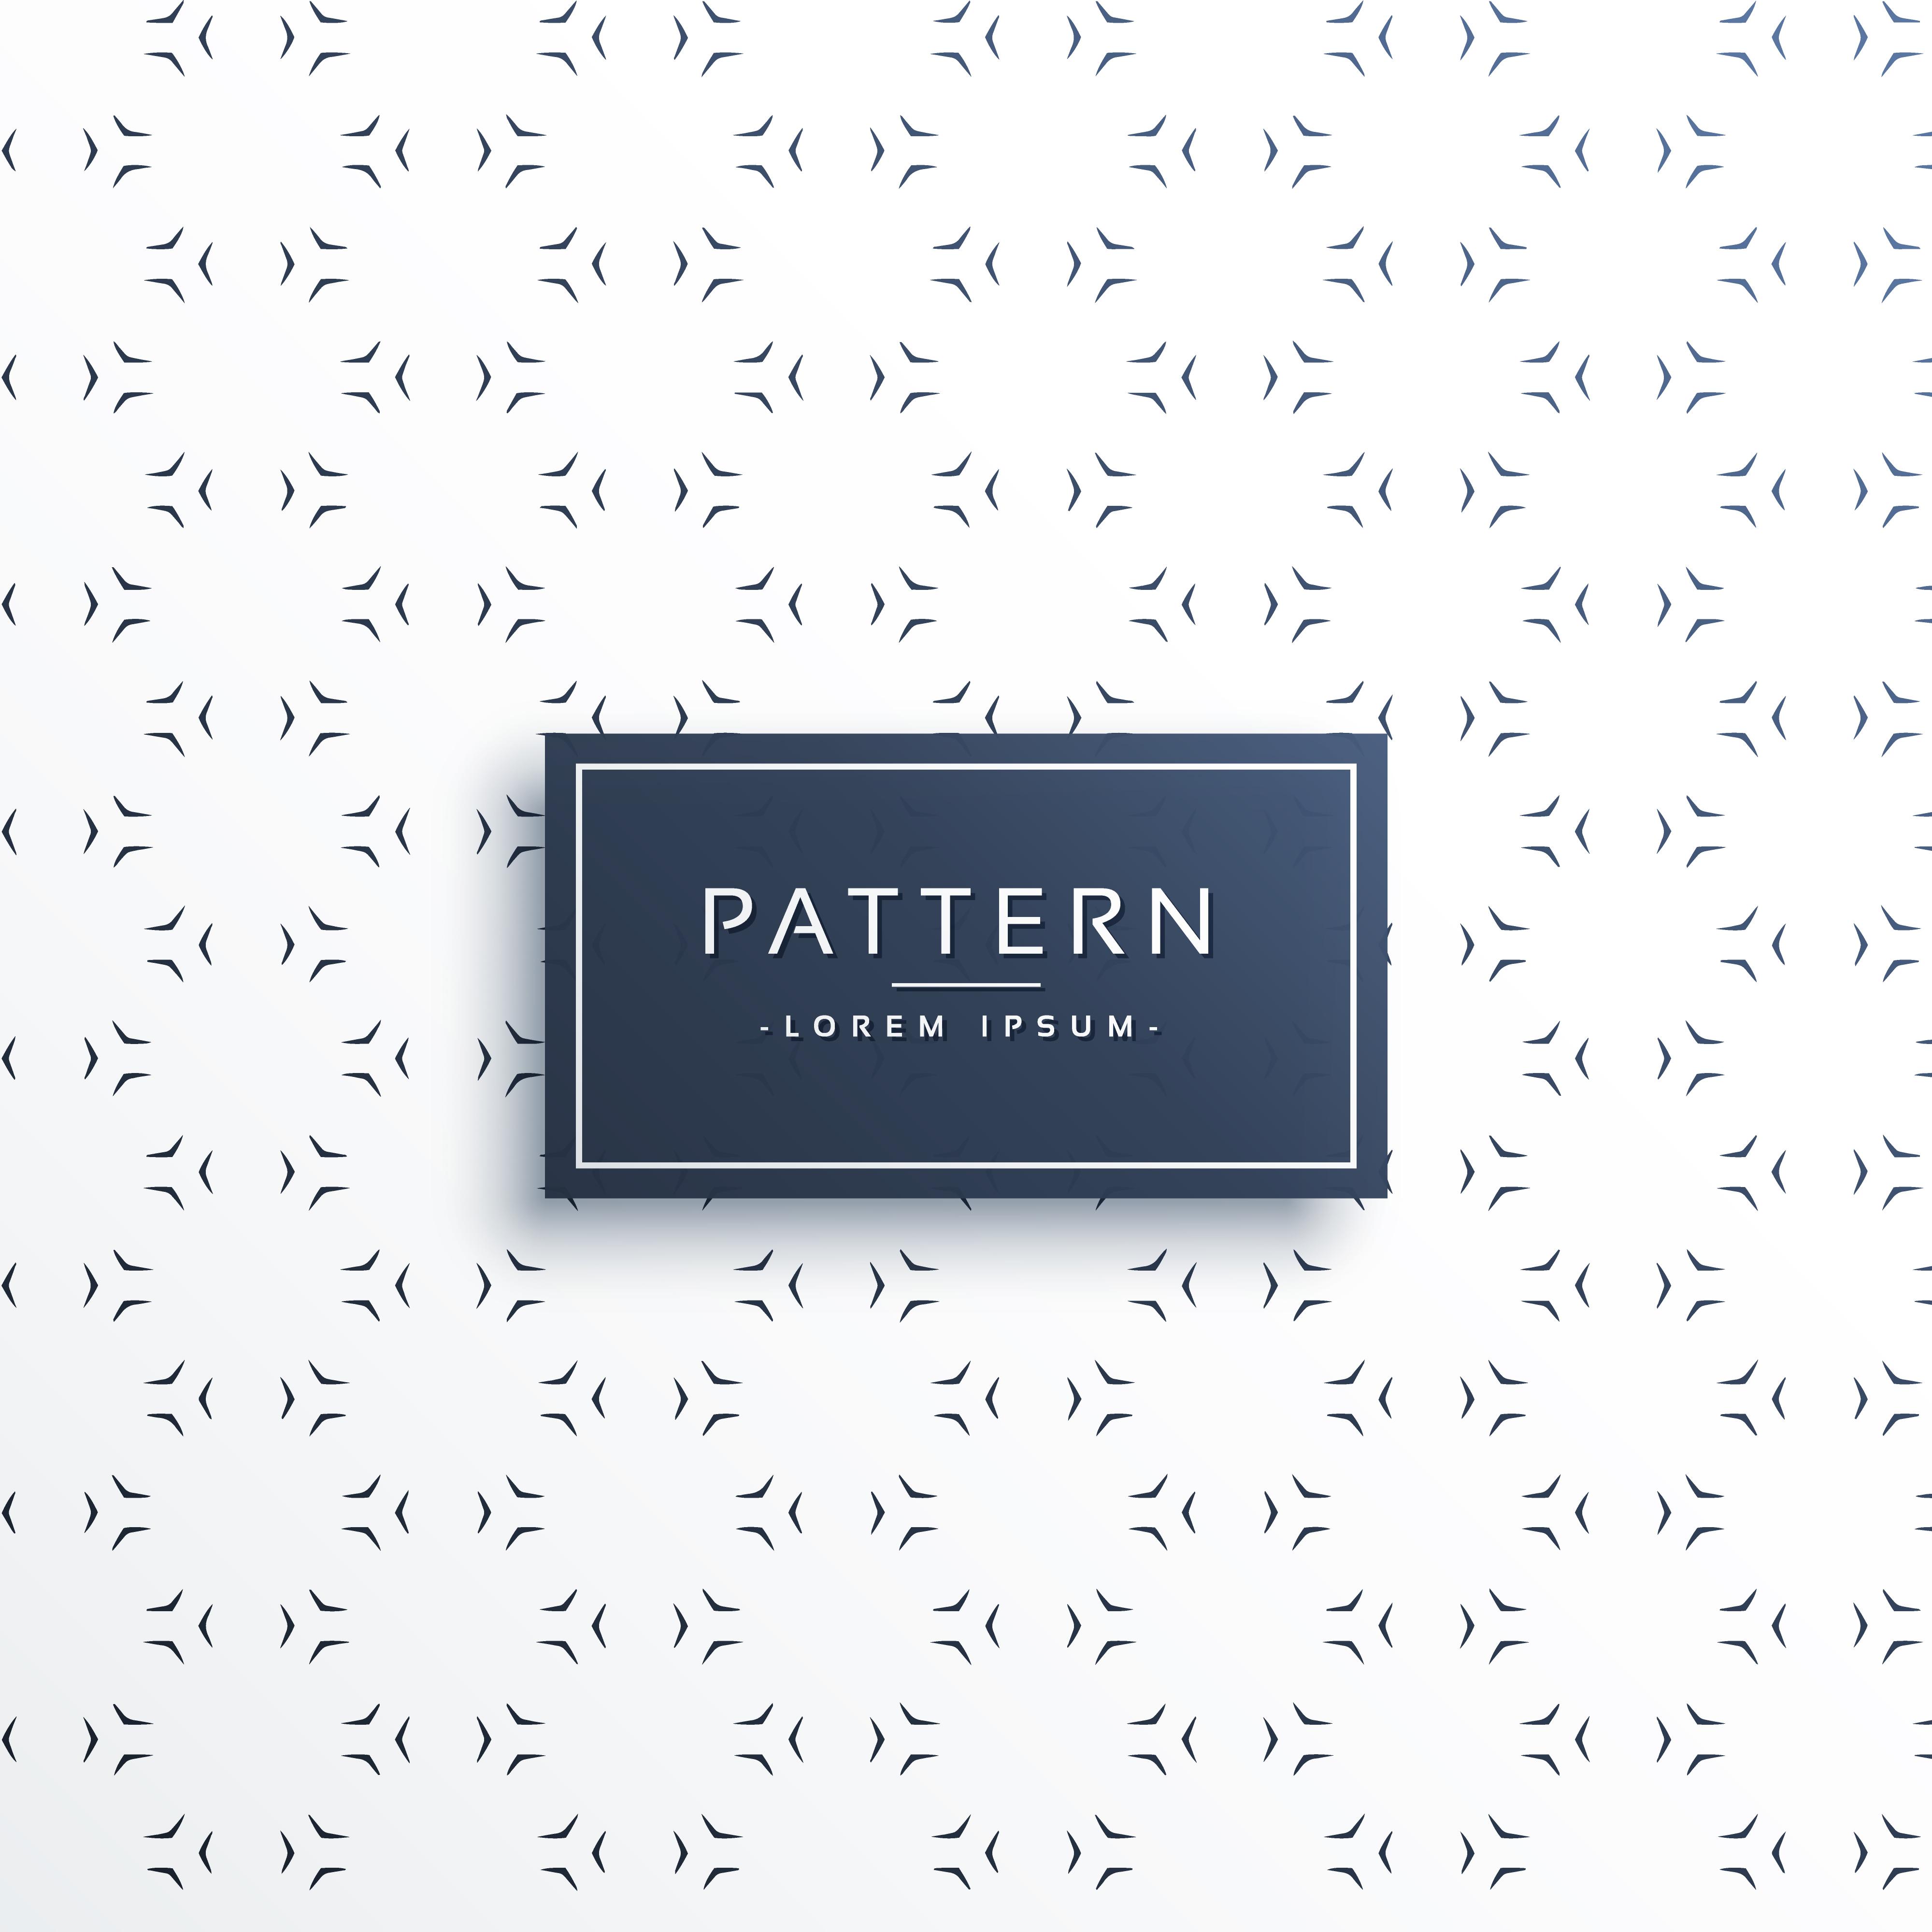 Minimal vector pattern background design download free for Minimal art vector